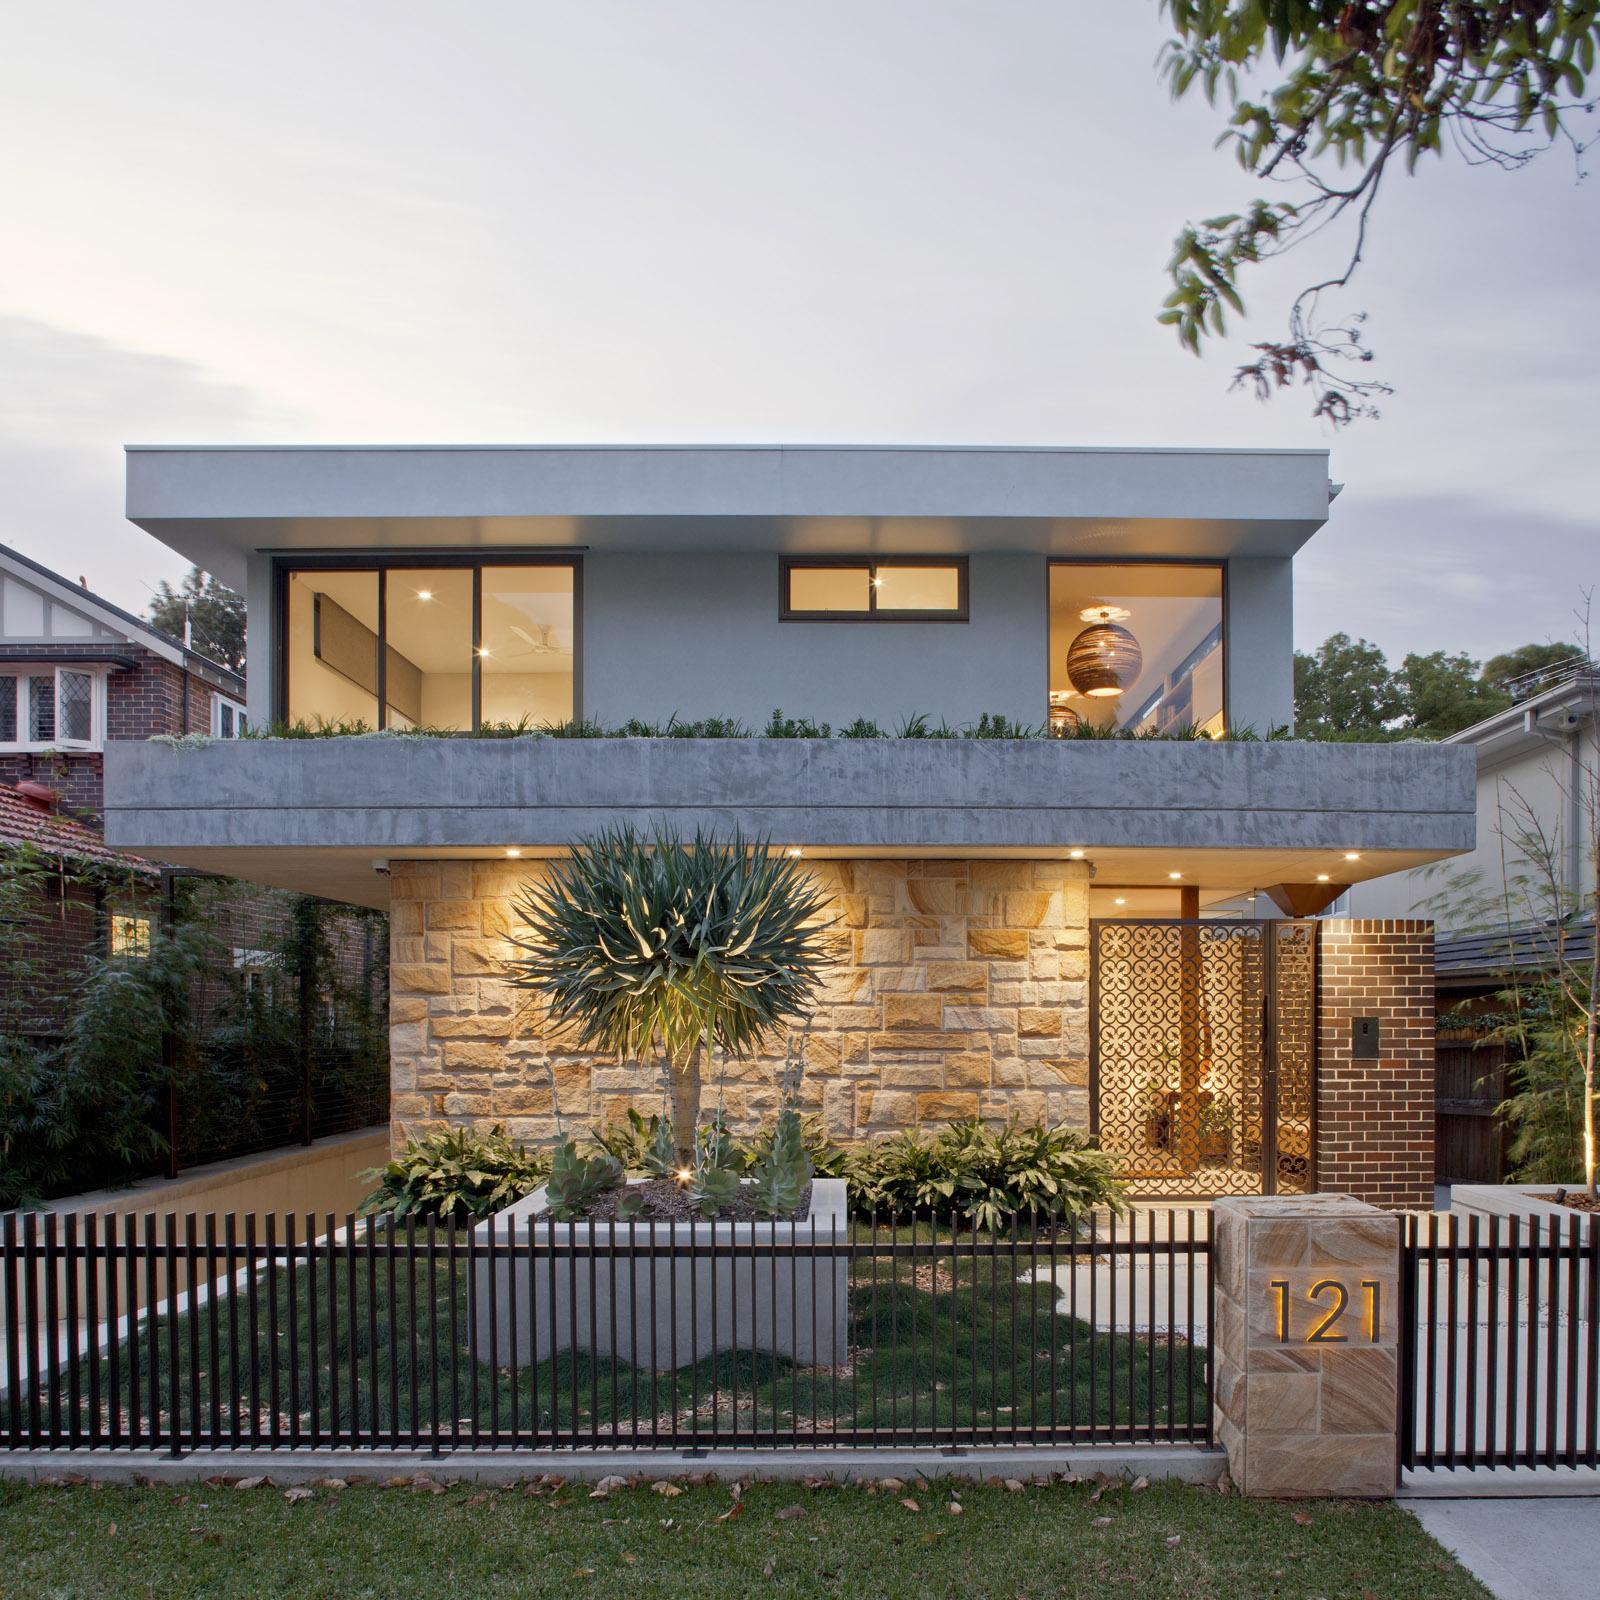 SWP_SRAI-CONCORD HOUSE_IMG_5240.jpg